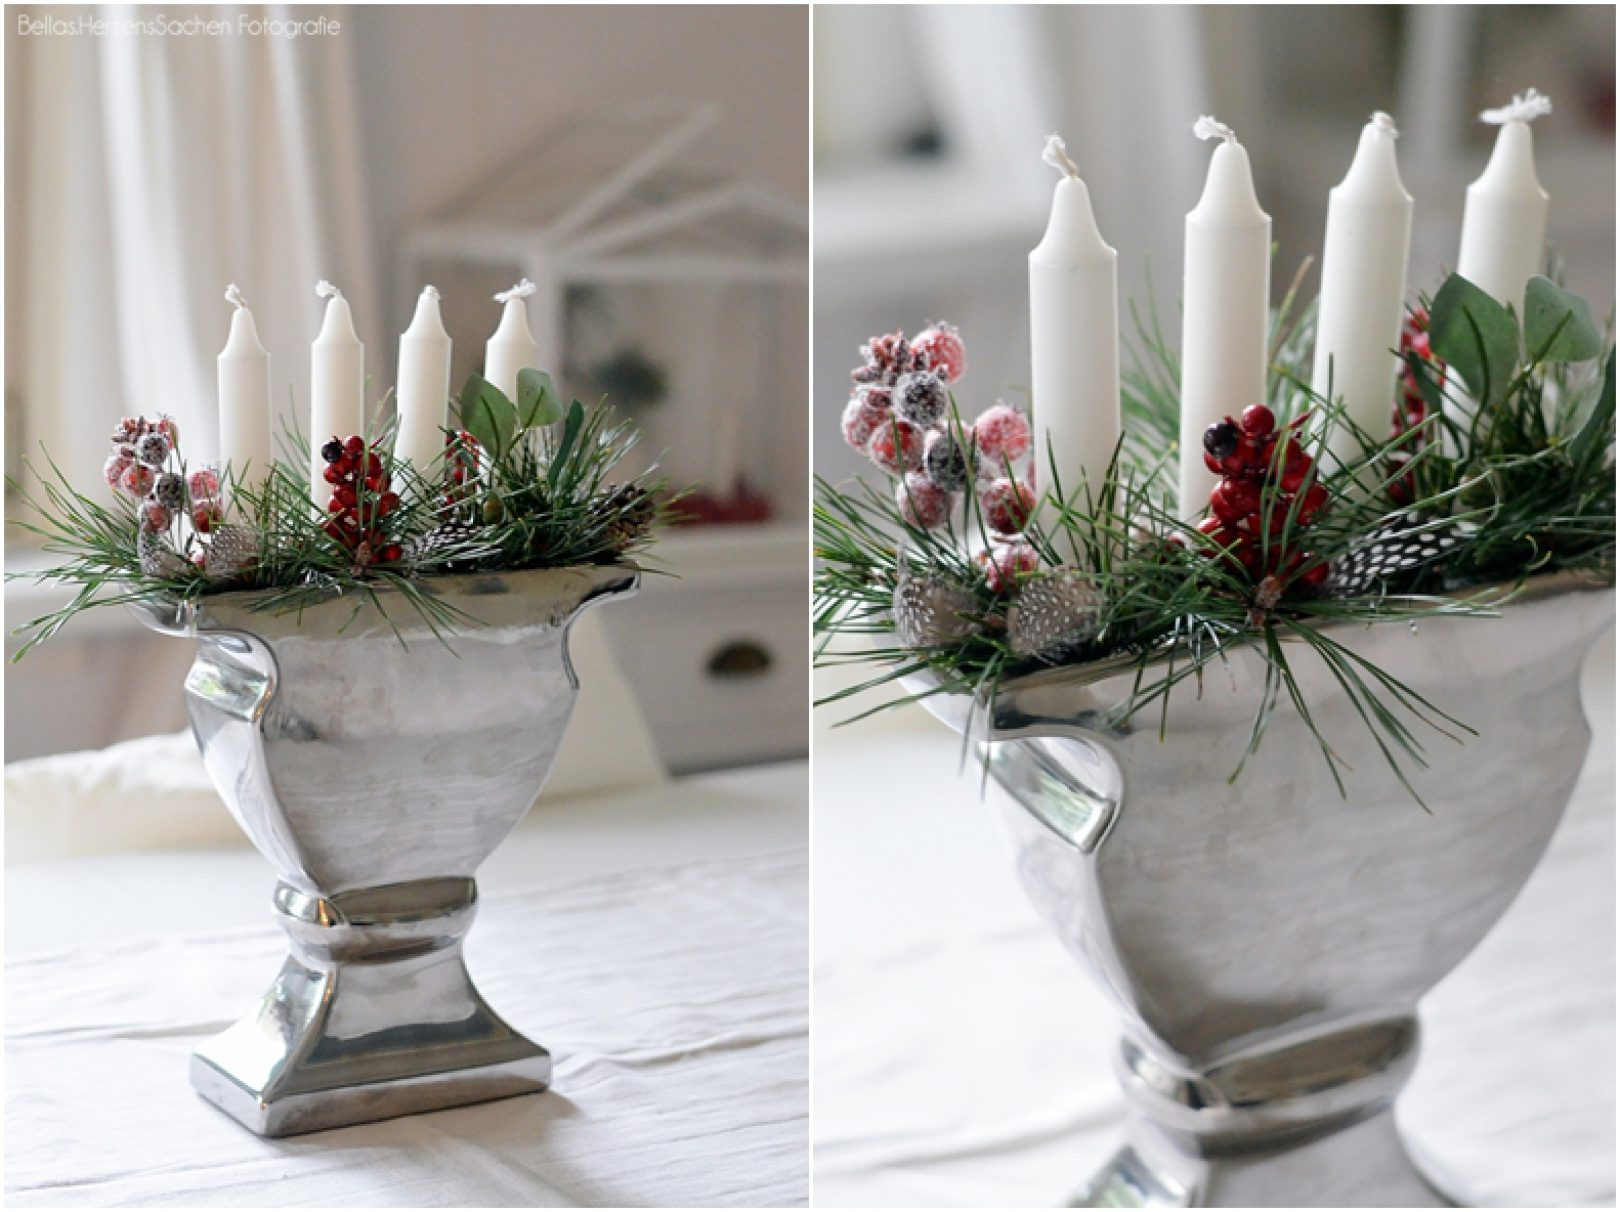 Adventskranz in Vase